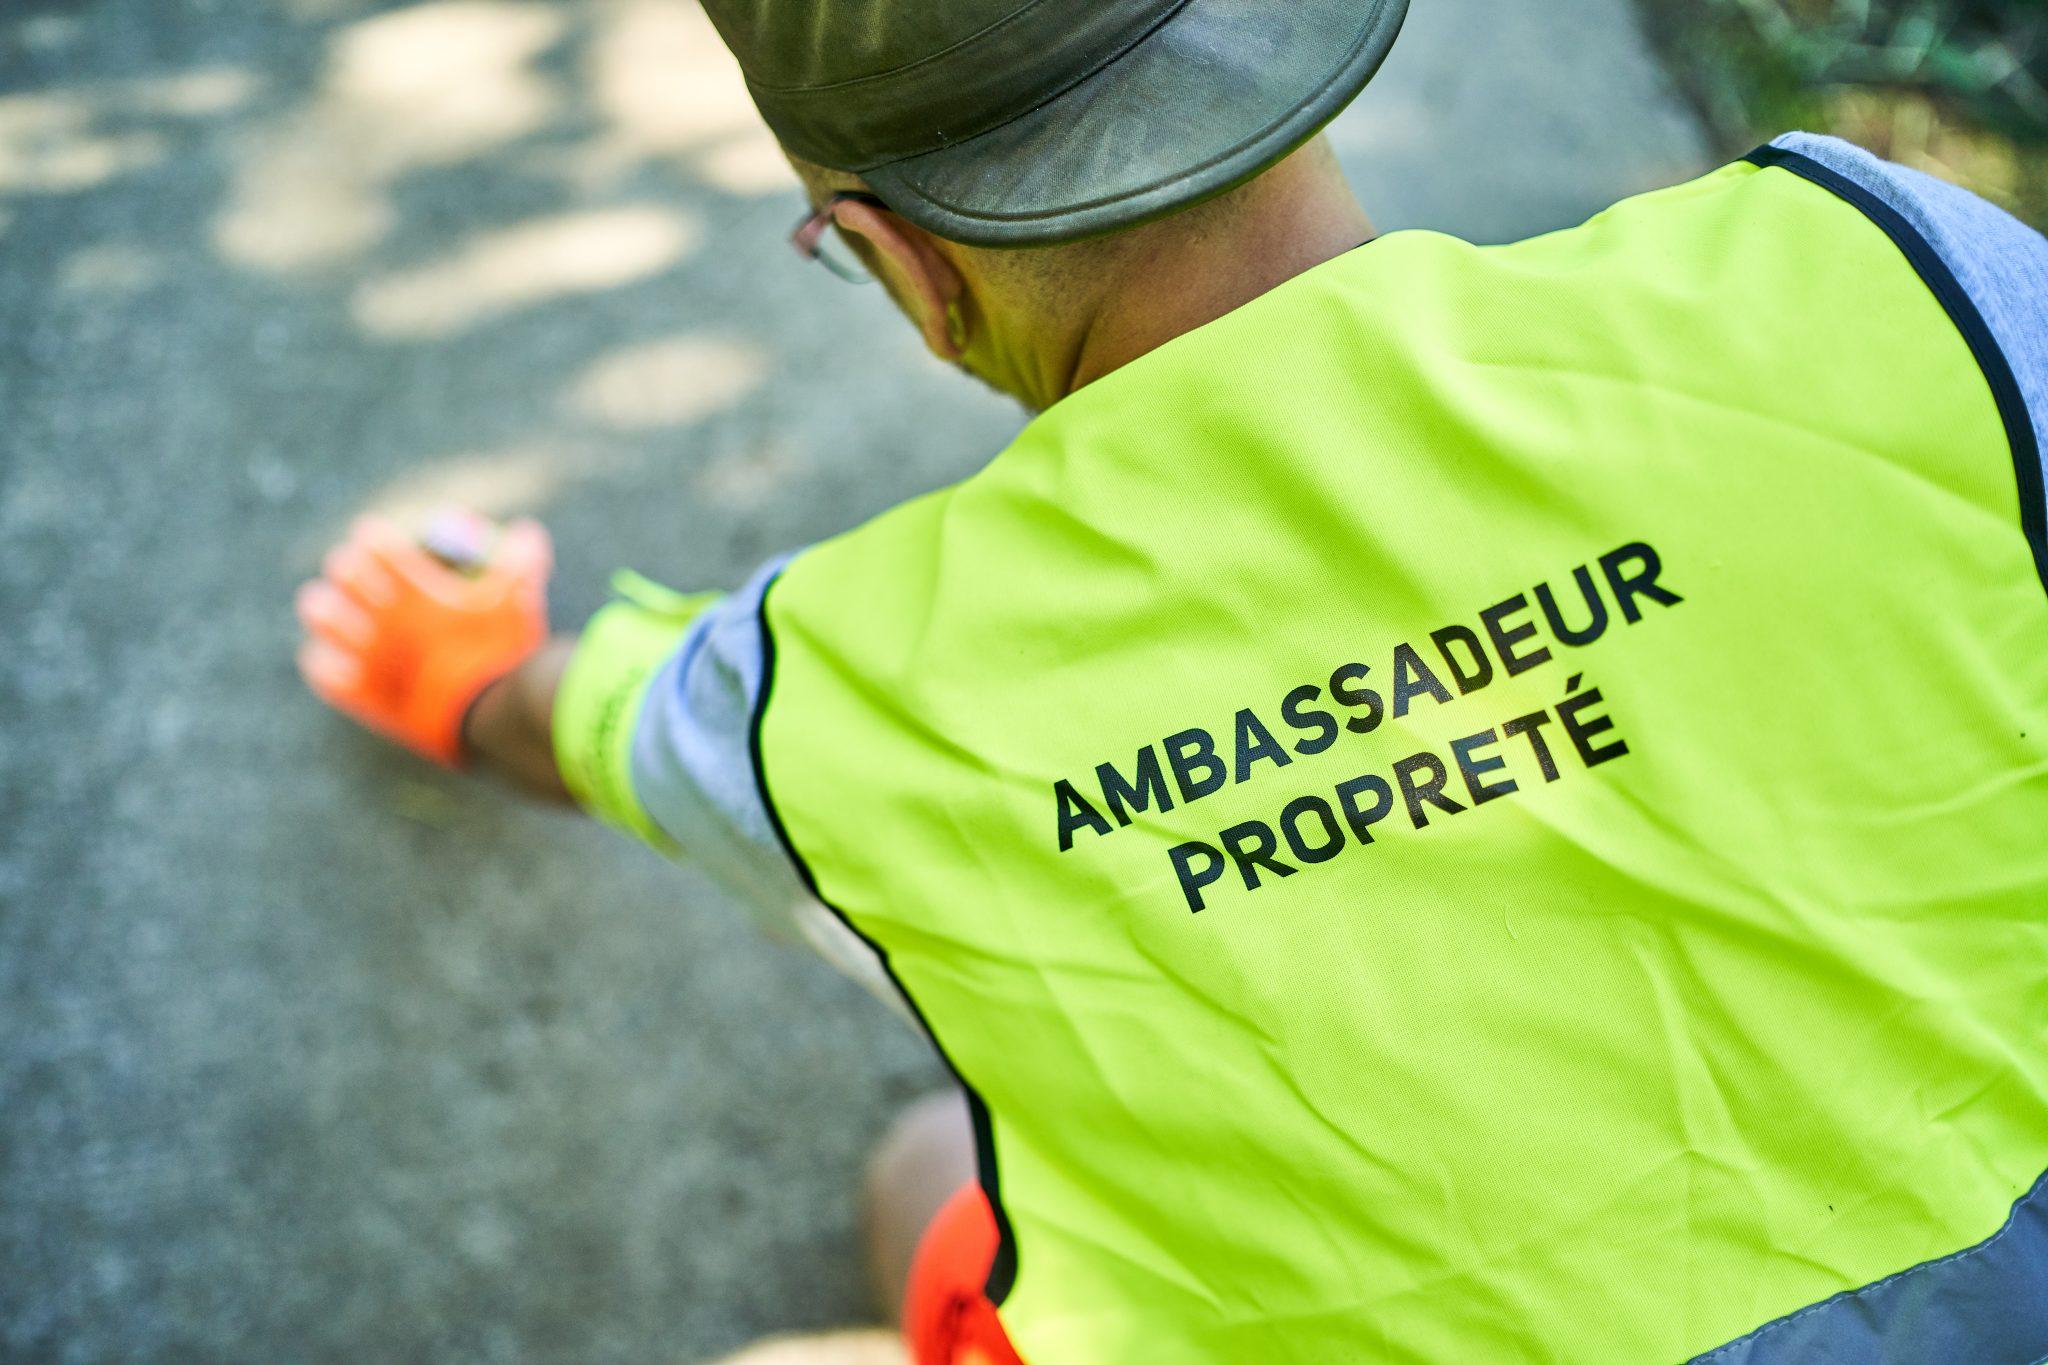 ambassadeur de la propreté